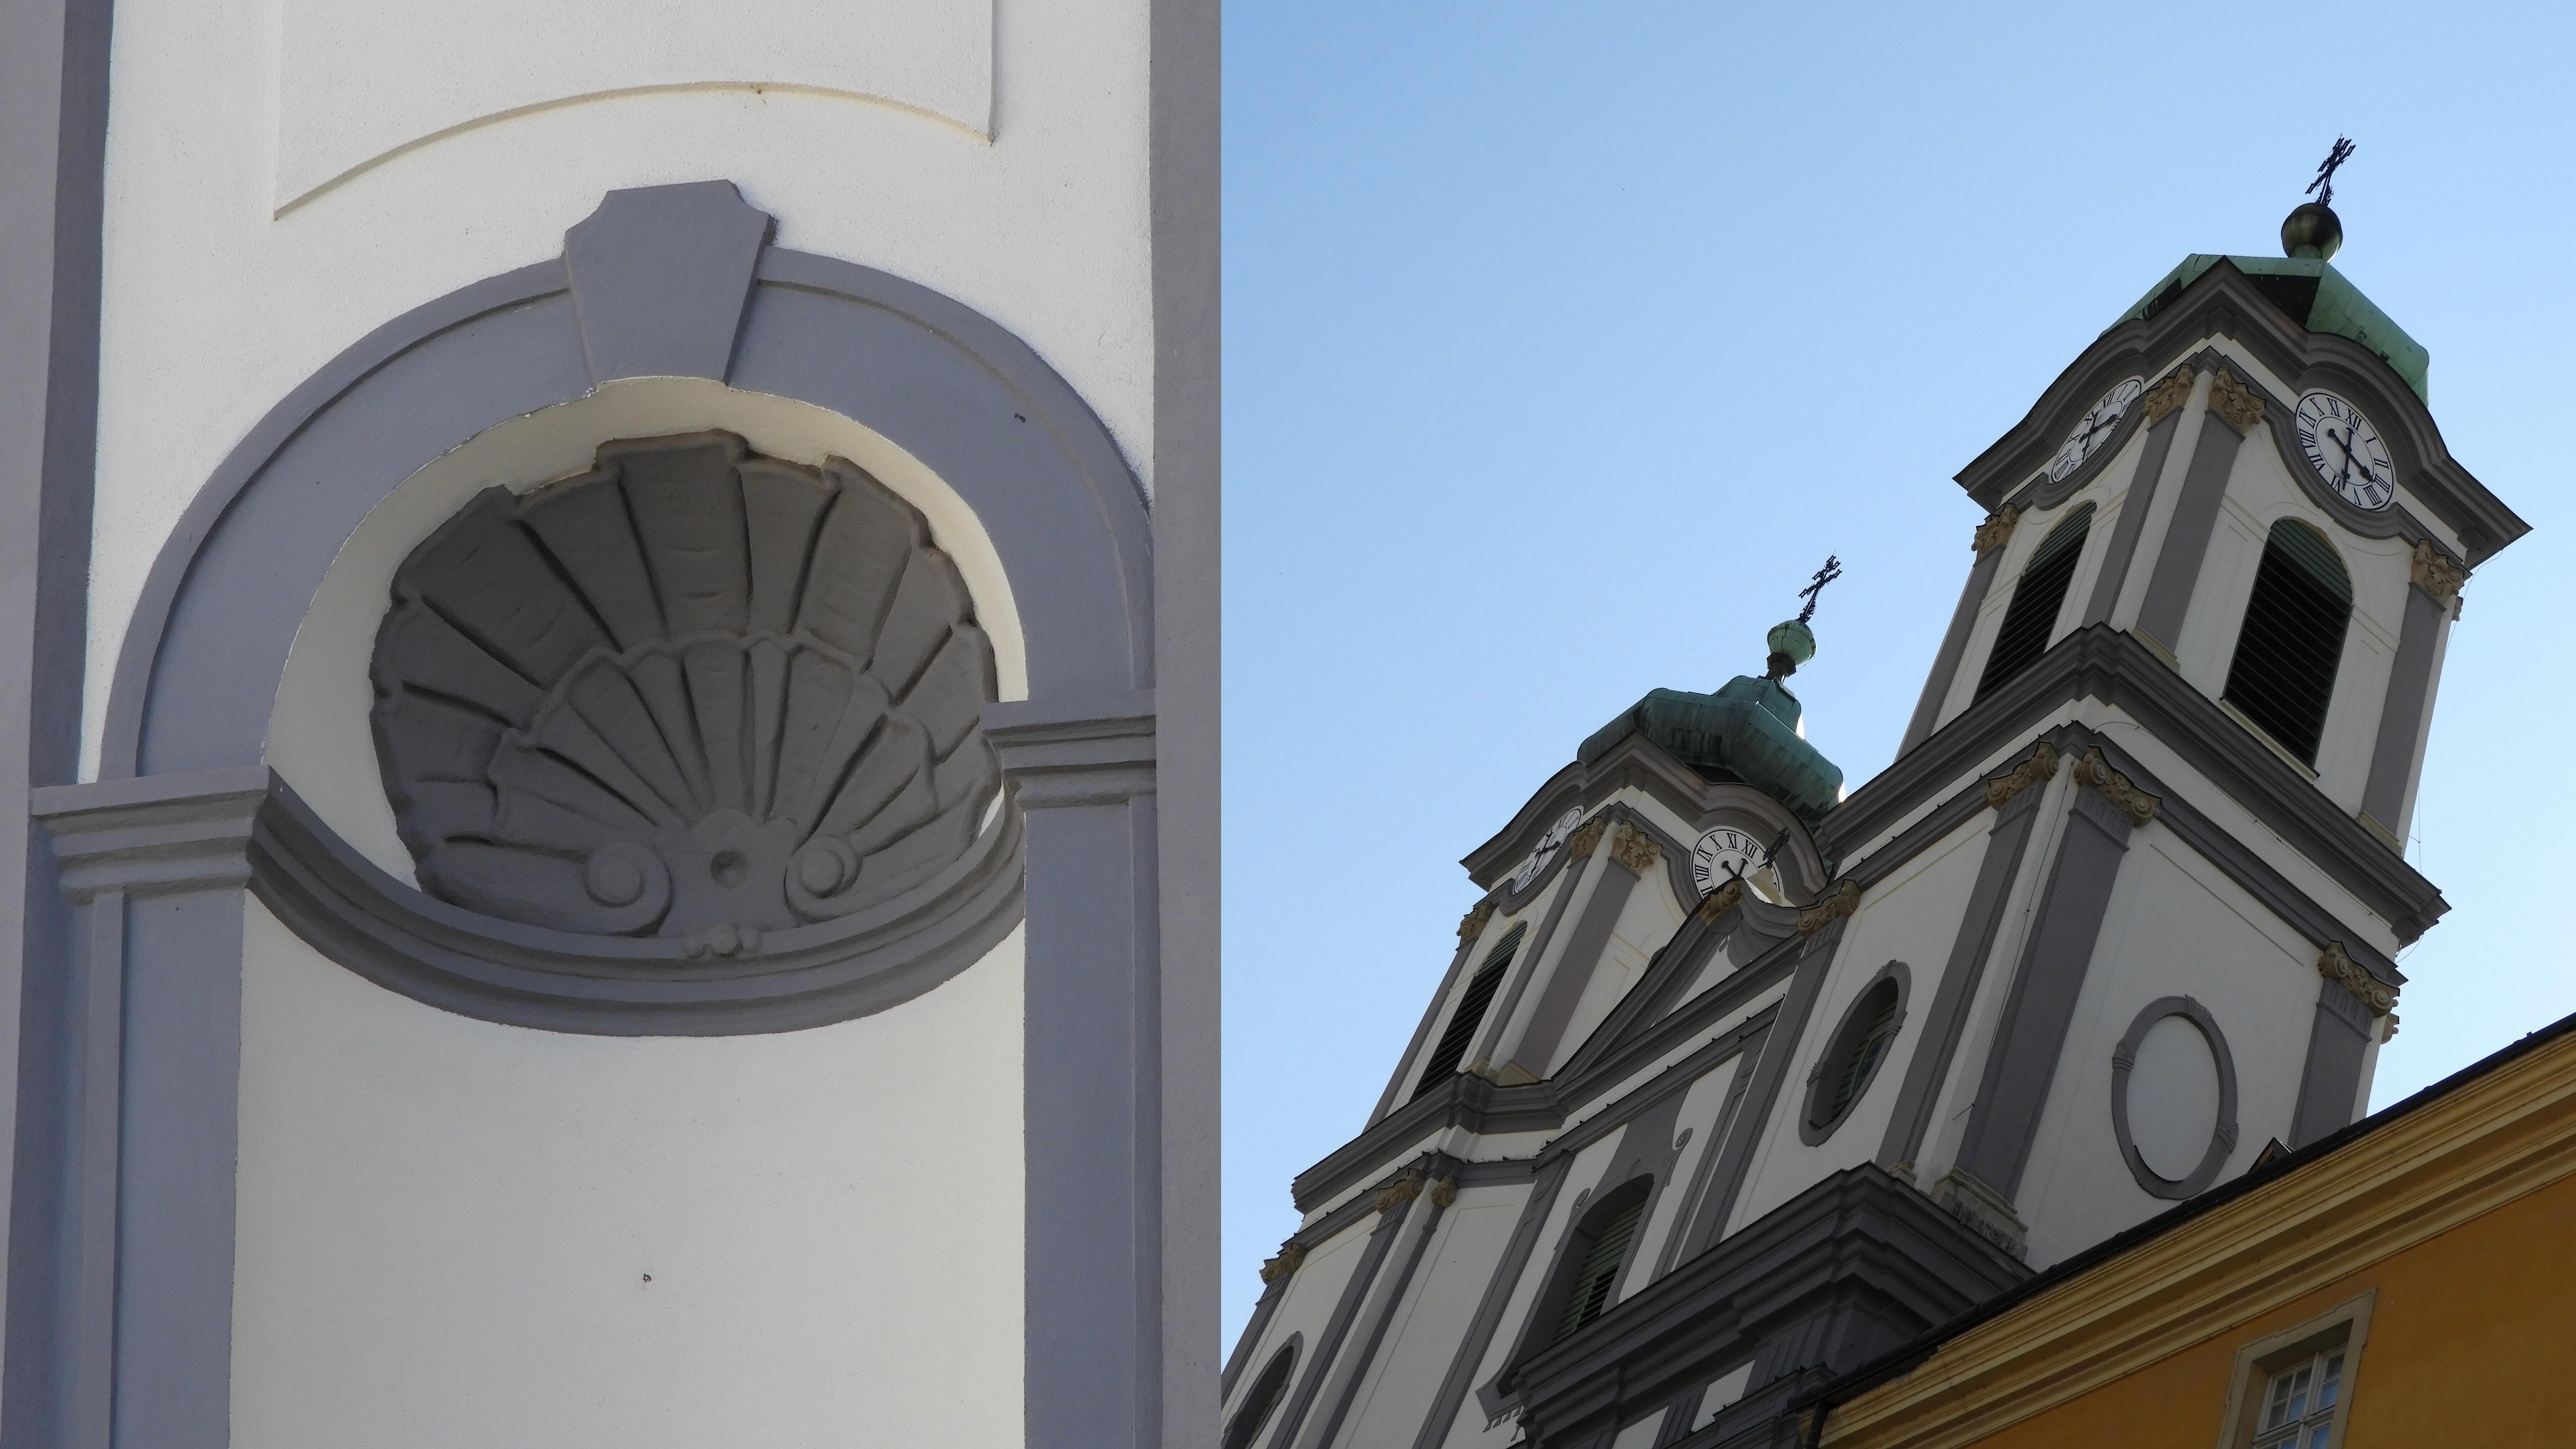 temploms3.jpg